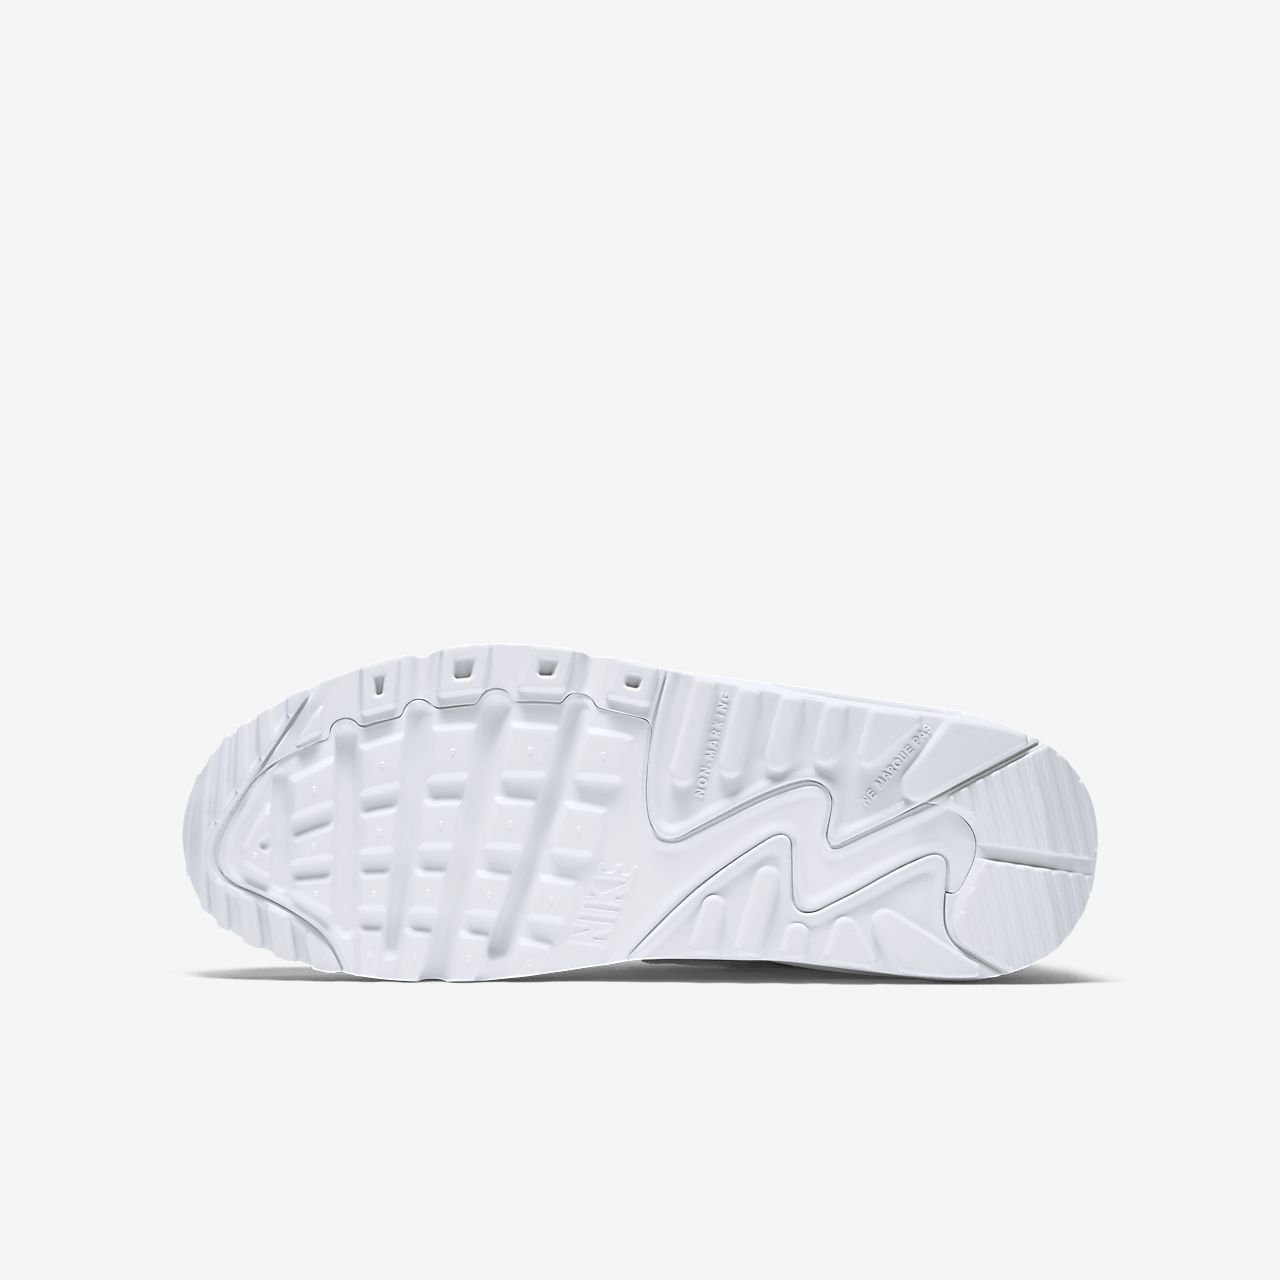 305fd1e57cd Nike Air Max 90 Leather Older Kids  Shoe. Nike.com GB